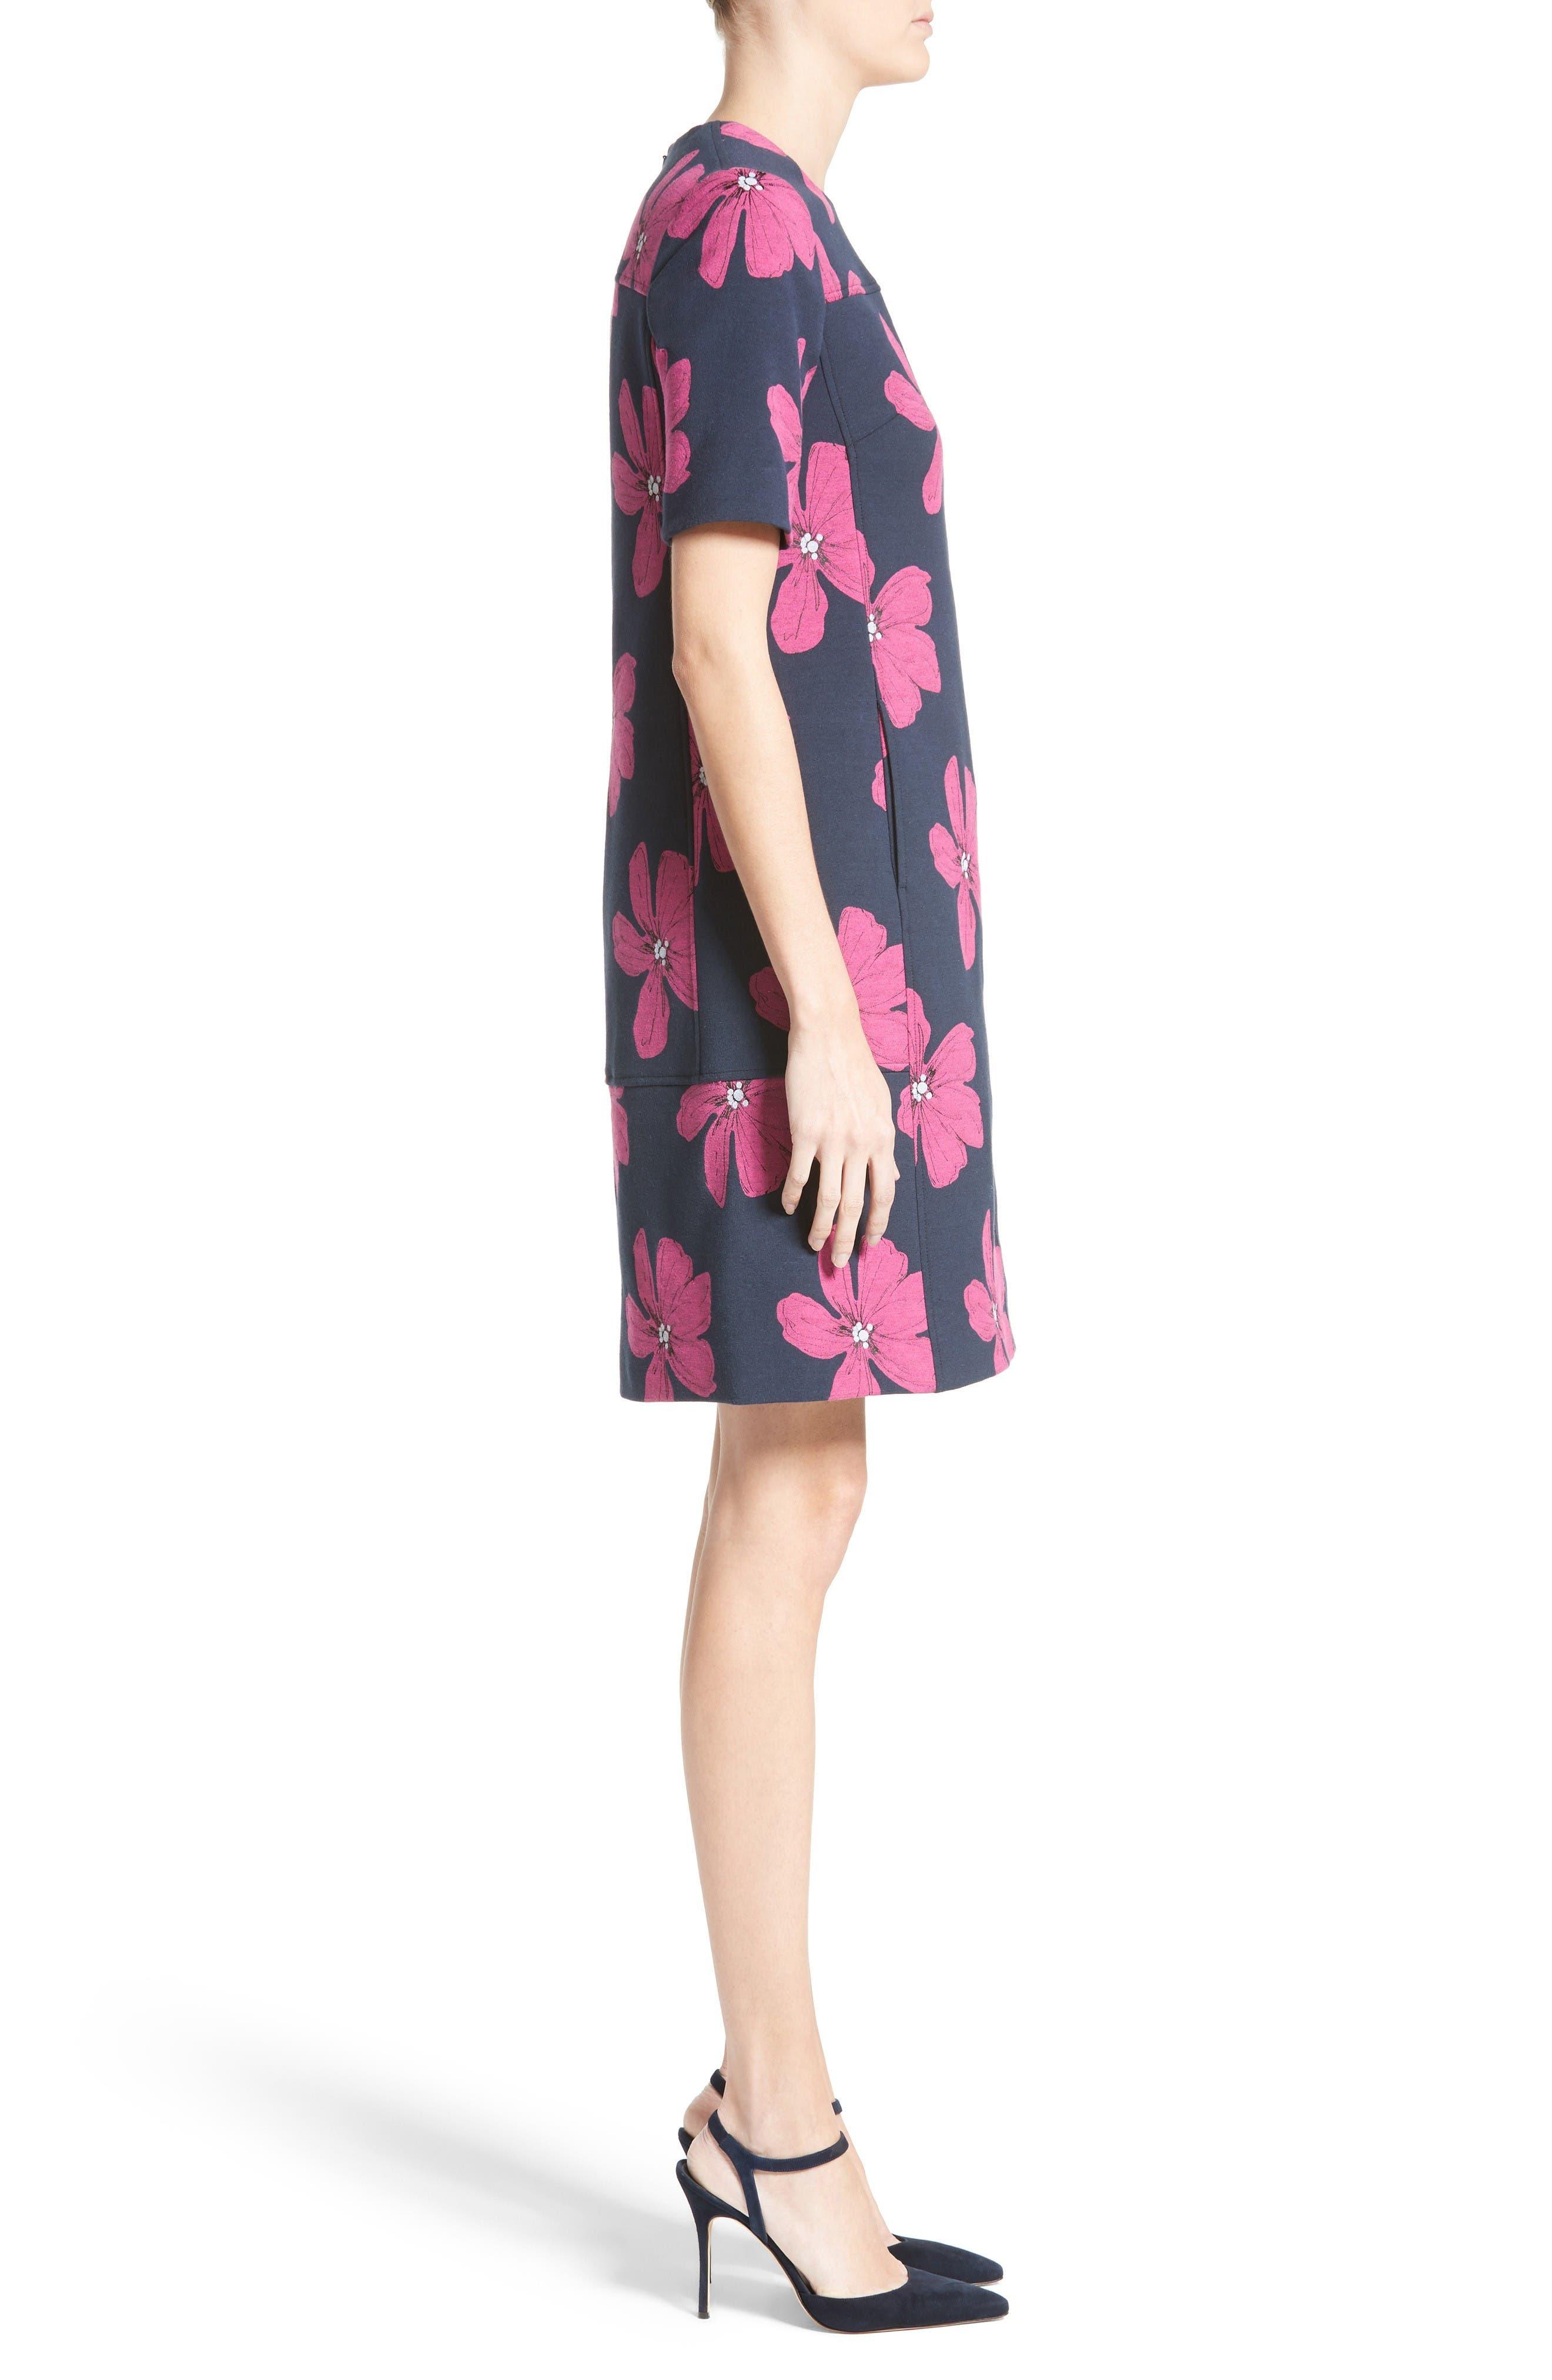 Floral Print Stretch Jacquard Tunic Dress,                             Alternate thumbnail 6, color,                             Navy/ Fuchsia